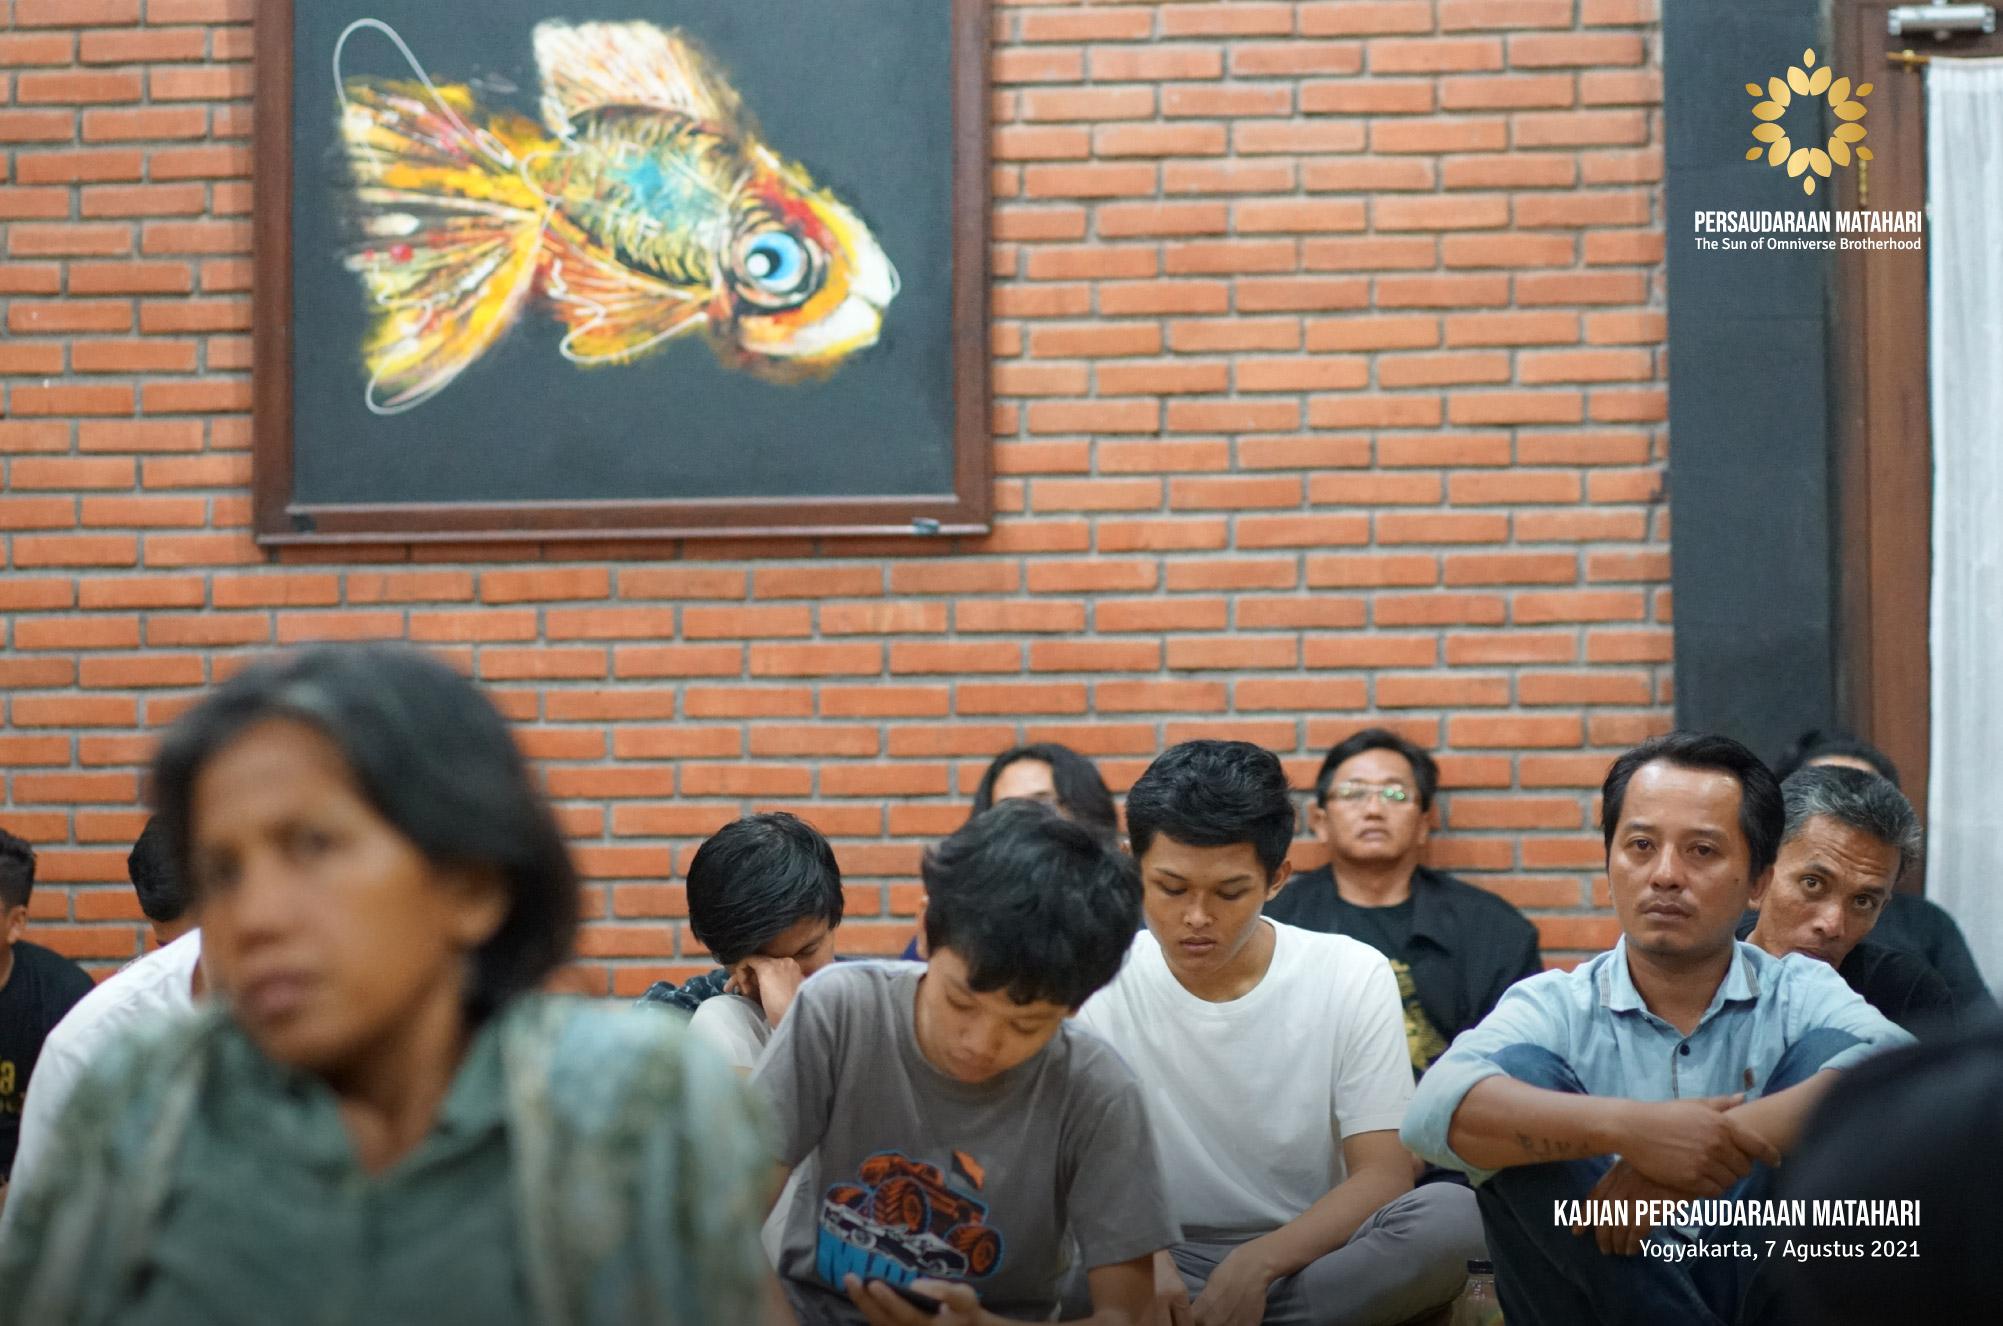 Kajian Yogyakarta – 7 Agustus 2021